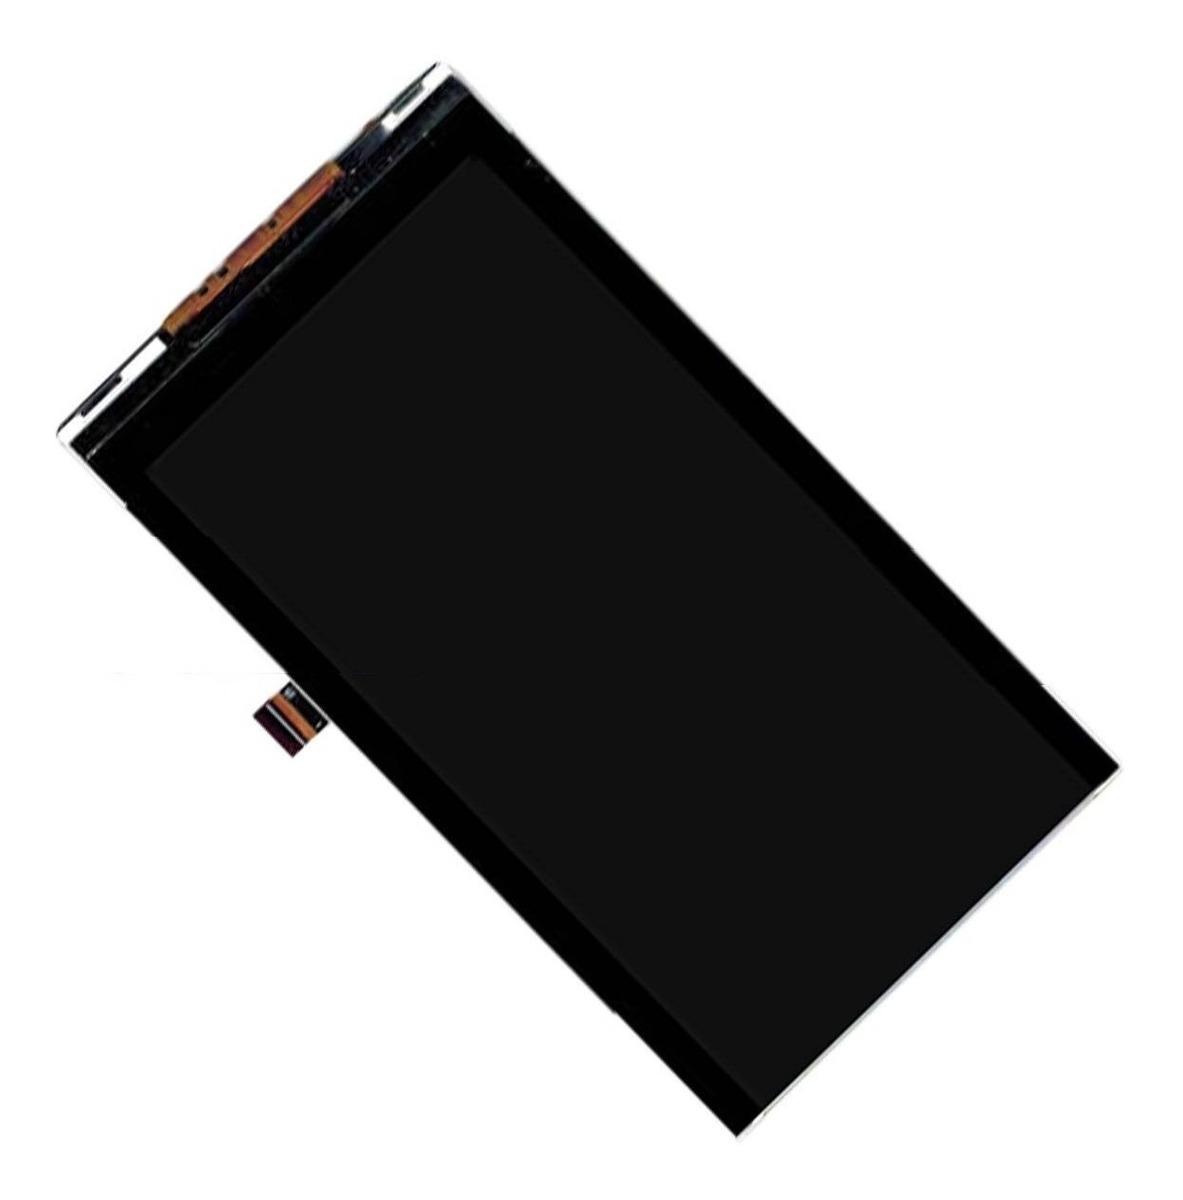 cdfd5b00b40 pantalla lcd display alcatel one touch pop c9 ot7047 7047d. Cargando zoom.